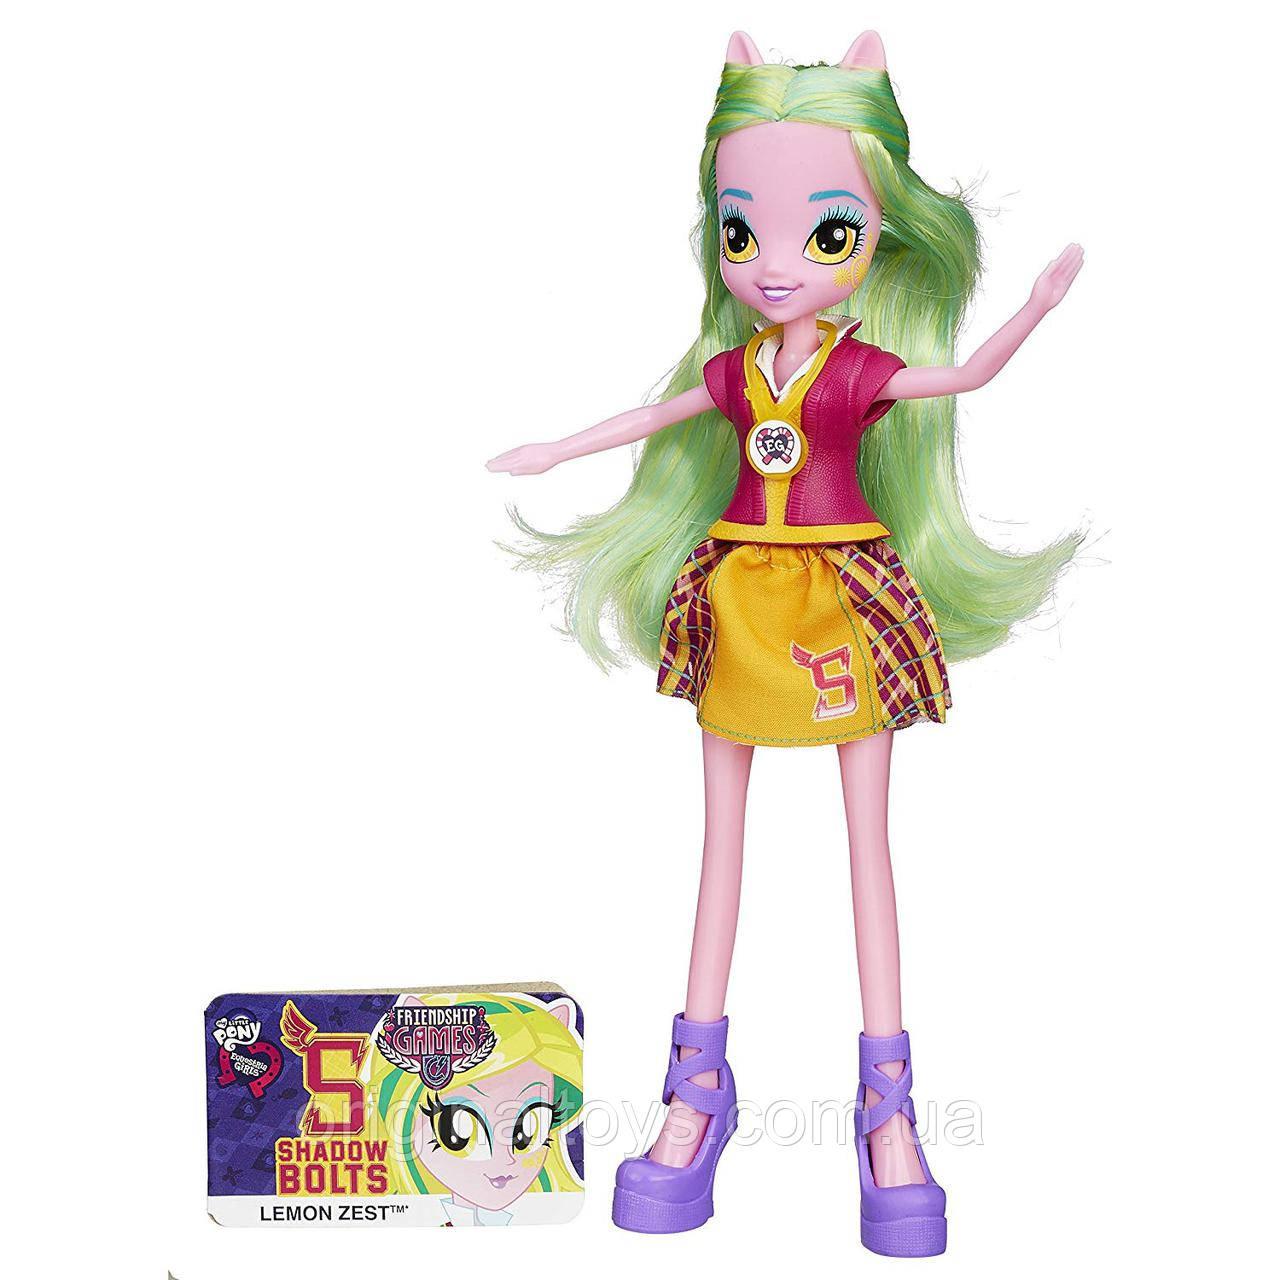 My Little Pony Кукла Лемон Зэст Девушки Эквестрии Школьный дух Игры Дружбы Friendship Games